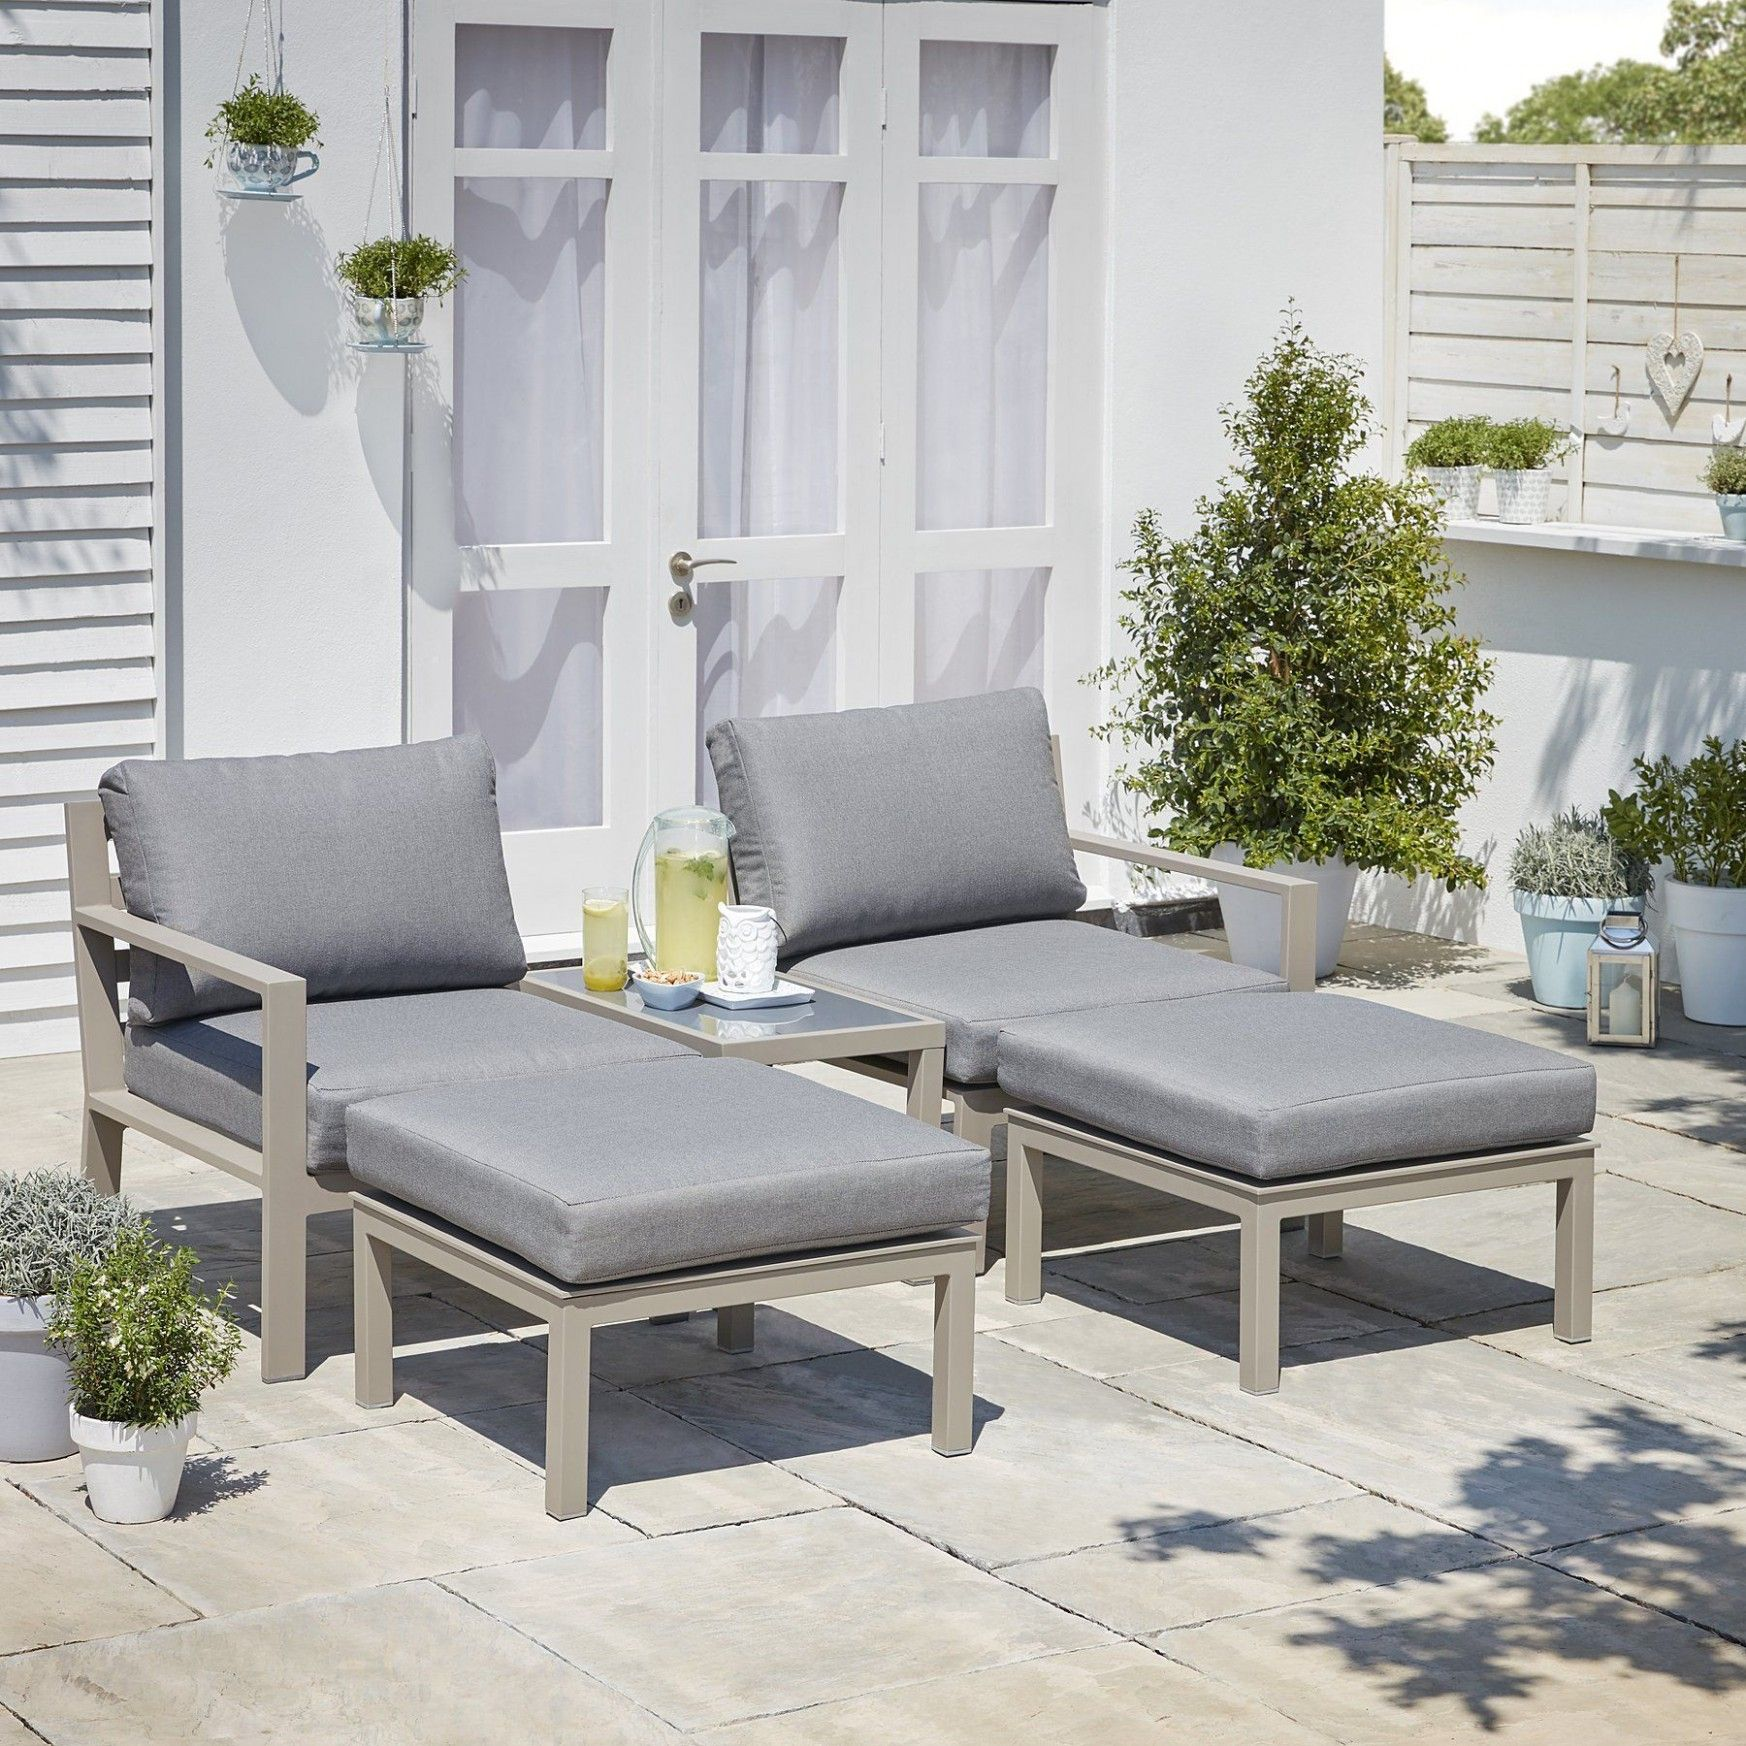 George Garden Furniture in 10  Furniture, Garden sofa diy